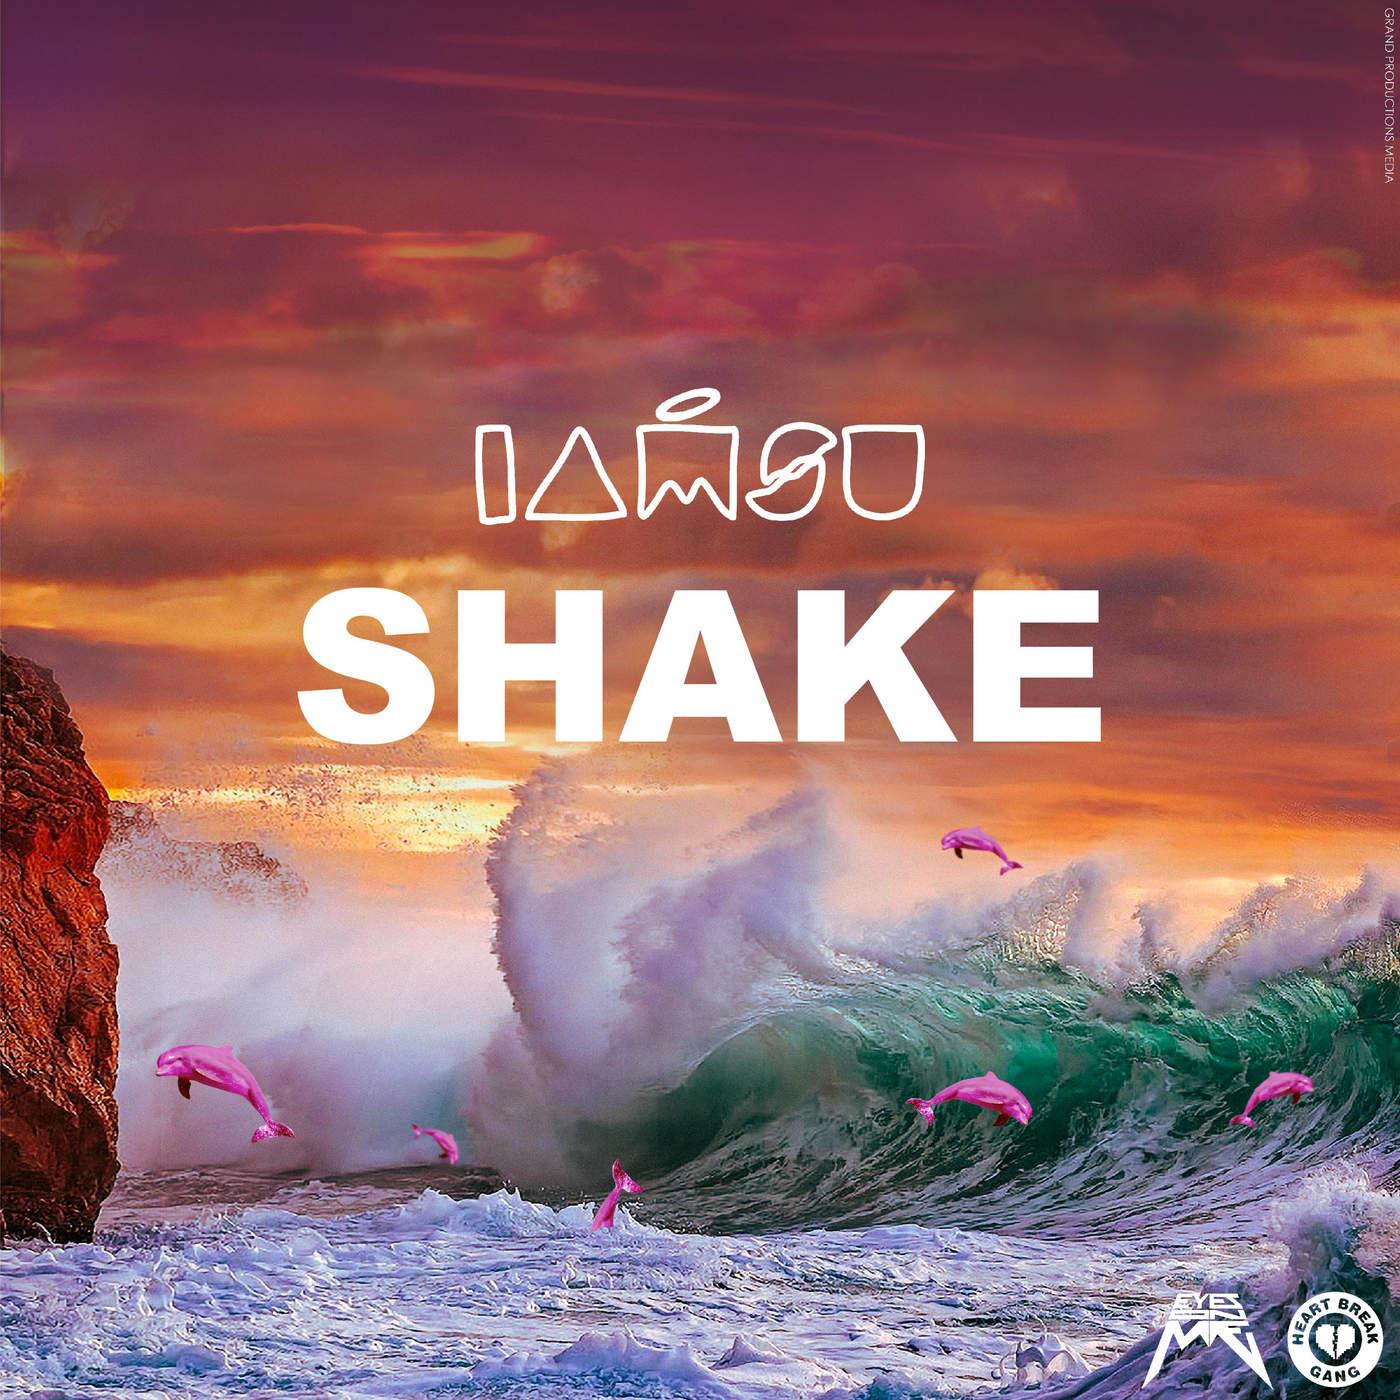 Iamsu! - Shake - Single Cover